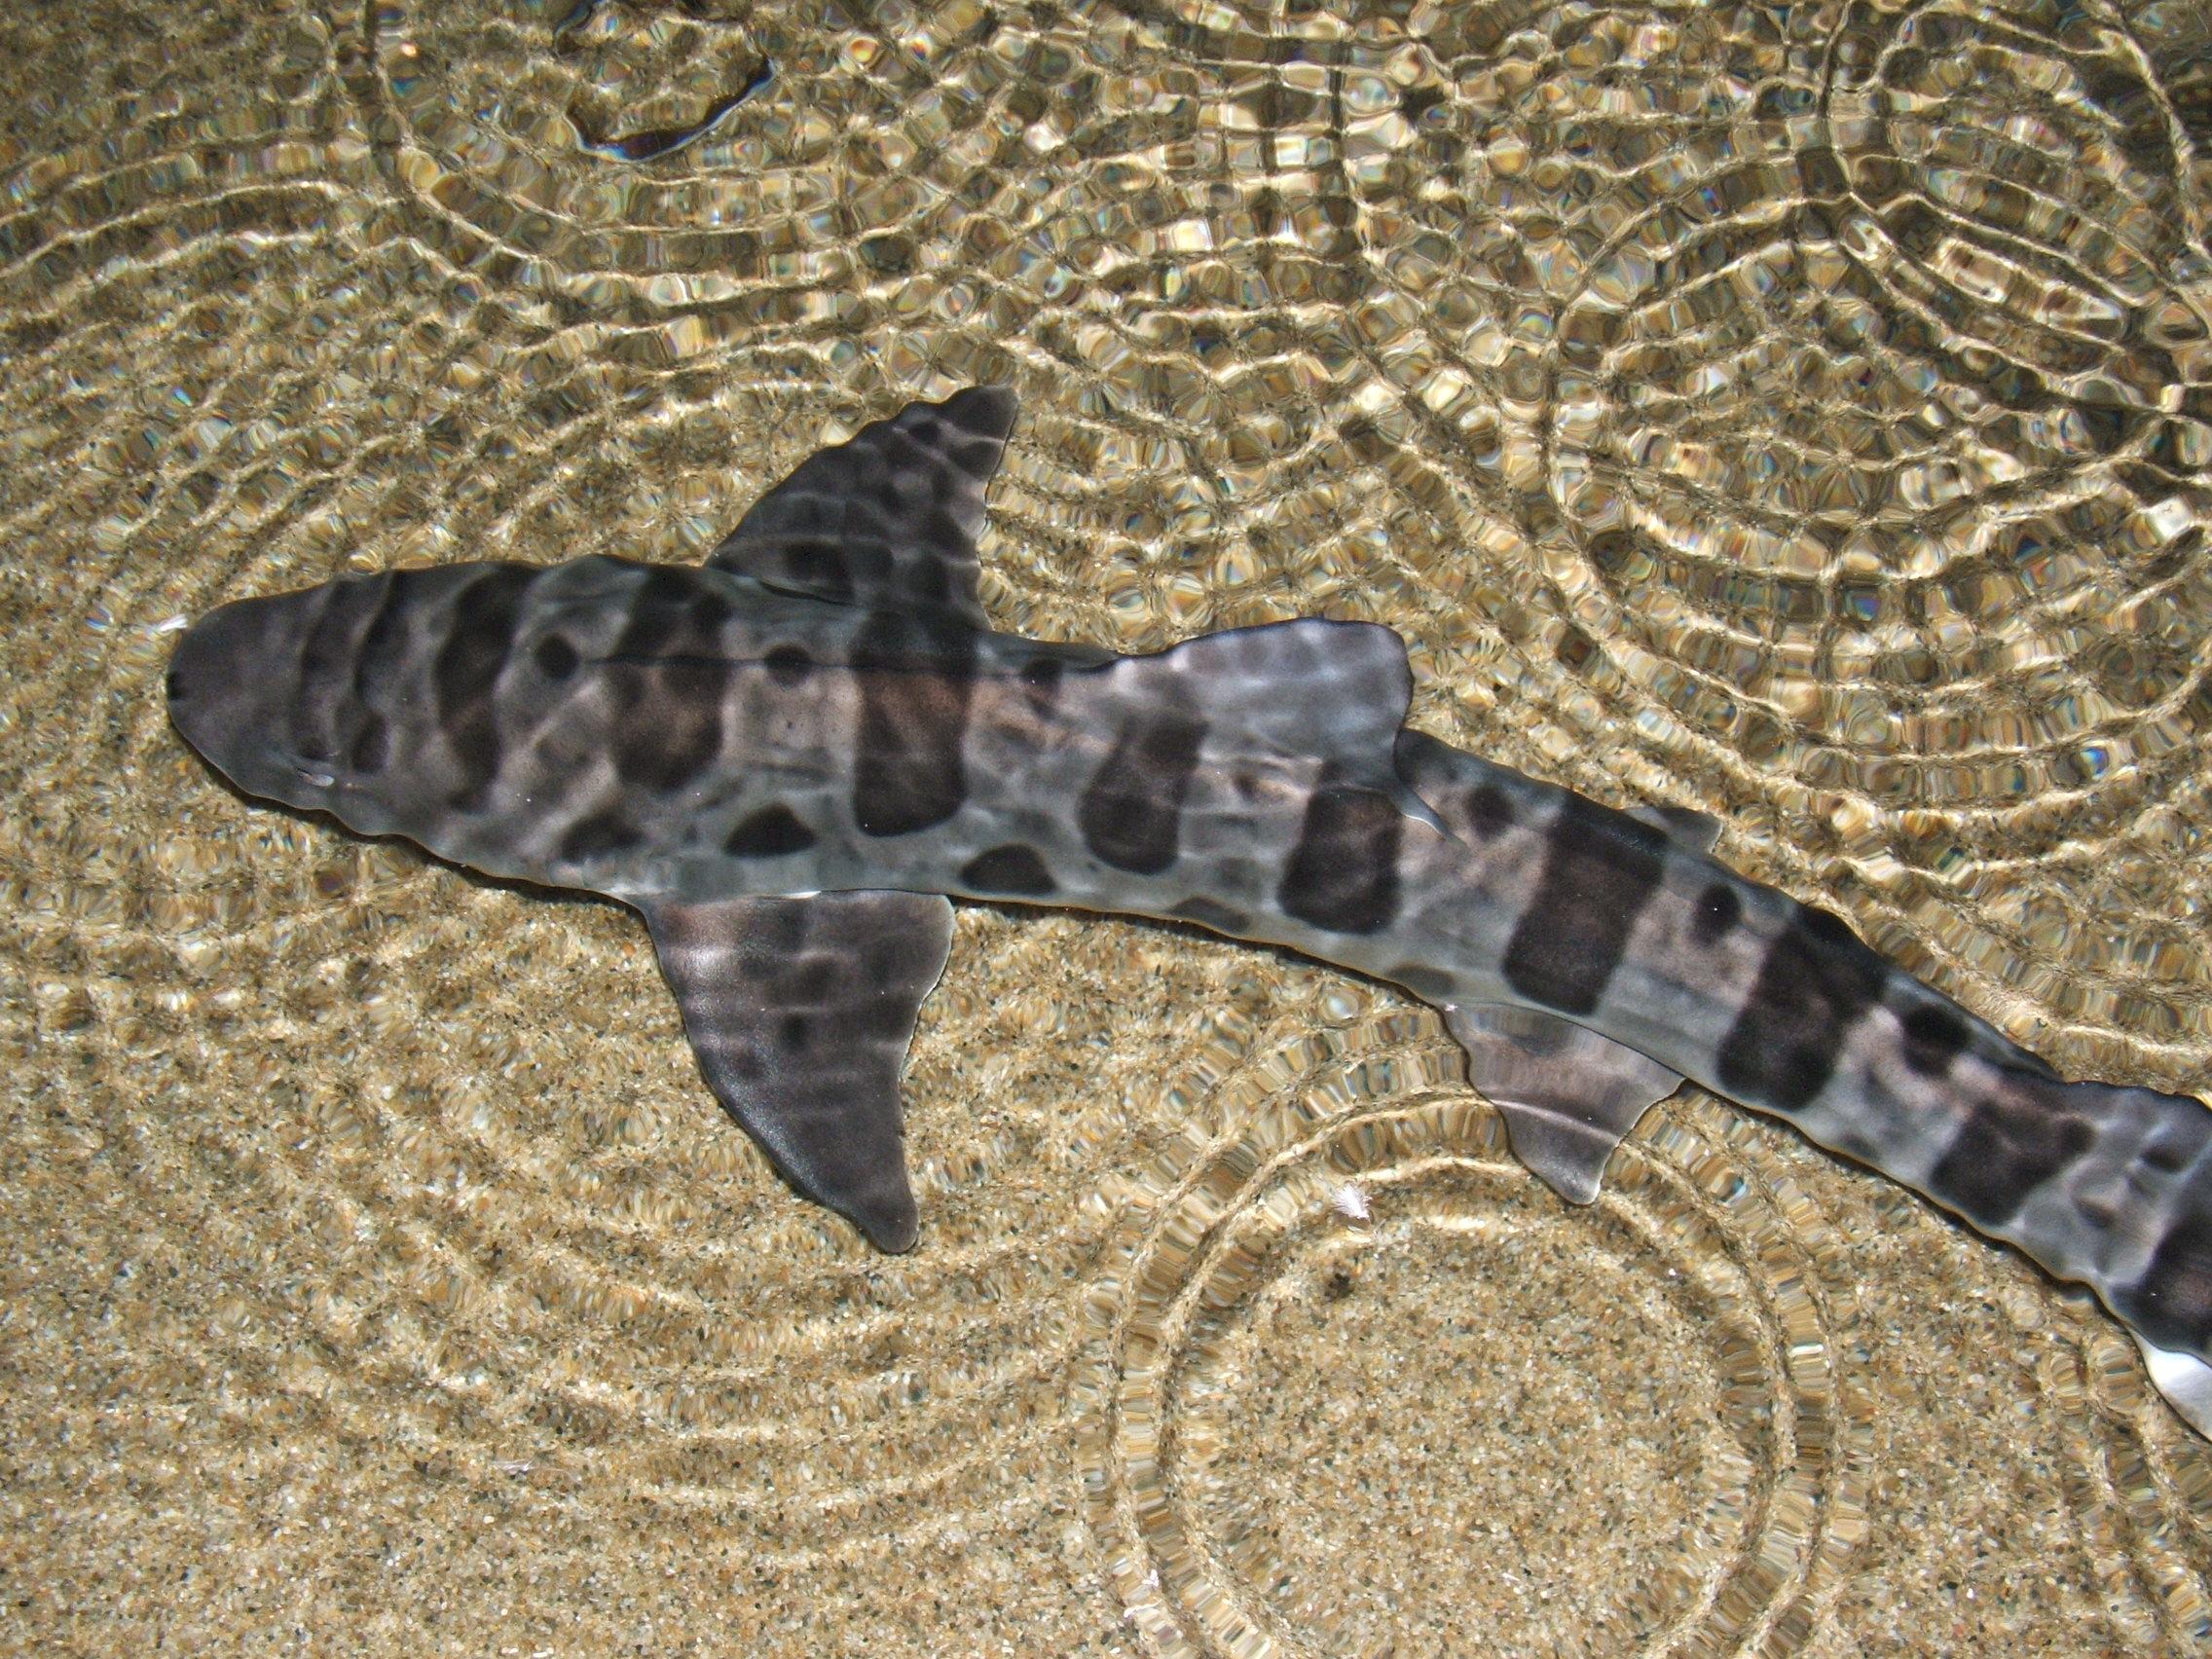 Leopard Shark Or California Native Fish Snorkeling Tour Laguna Beach